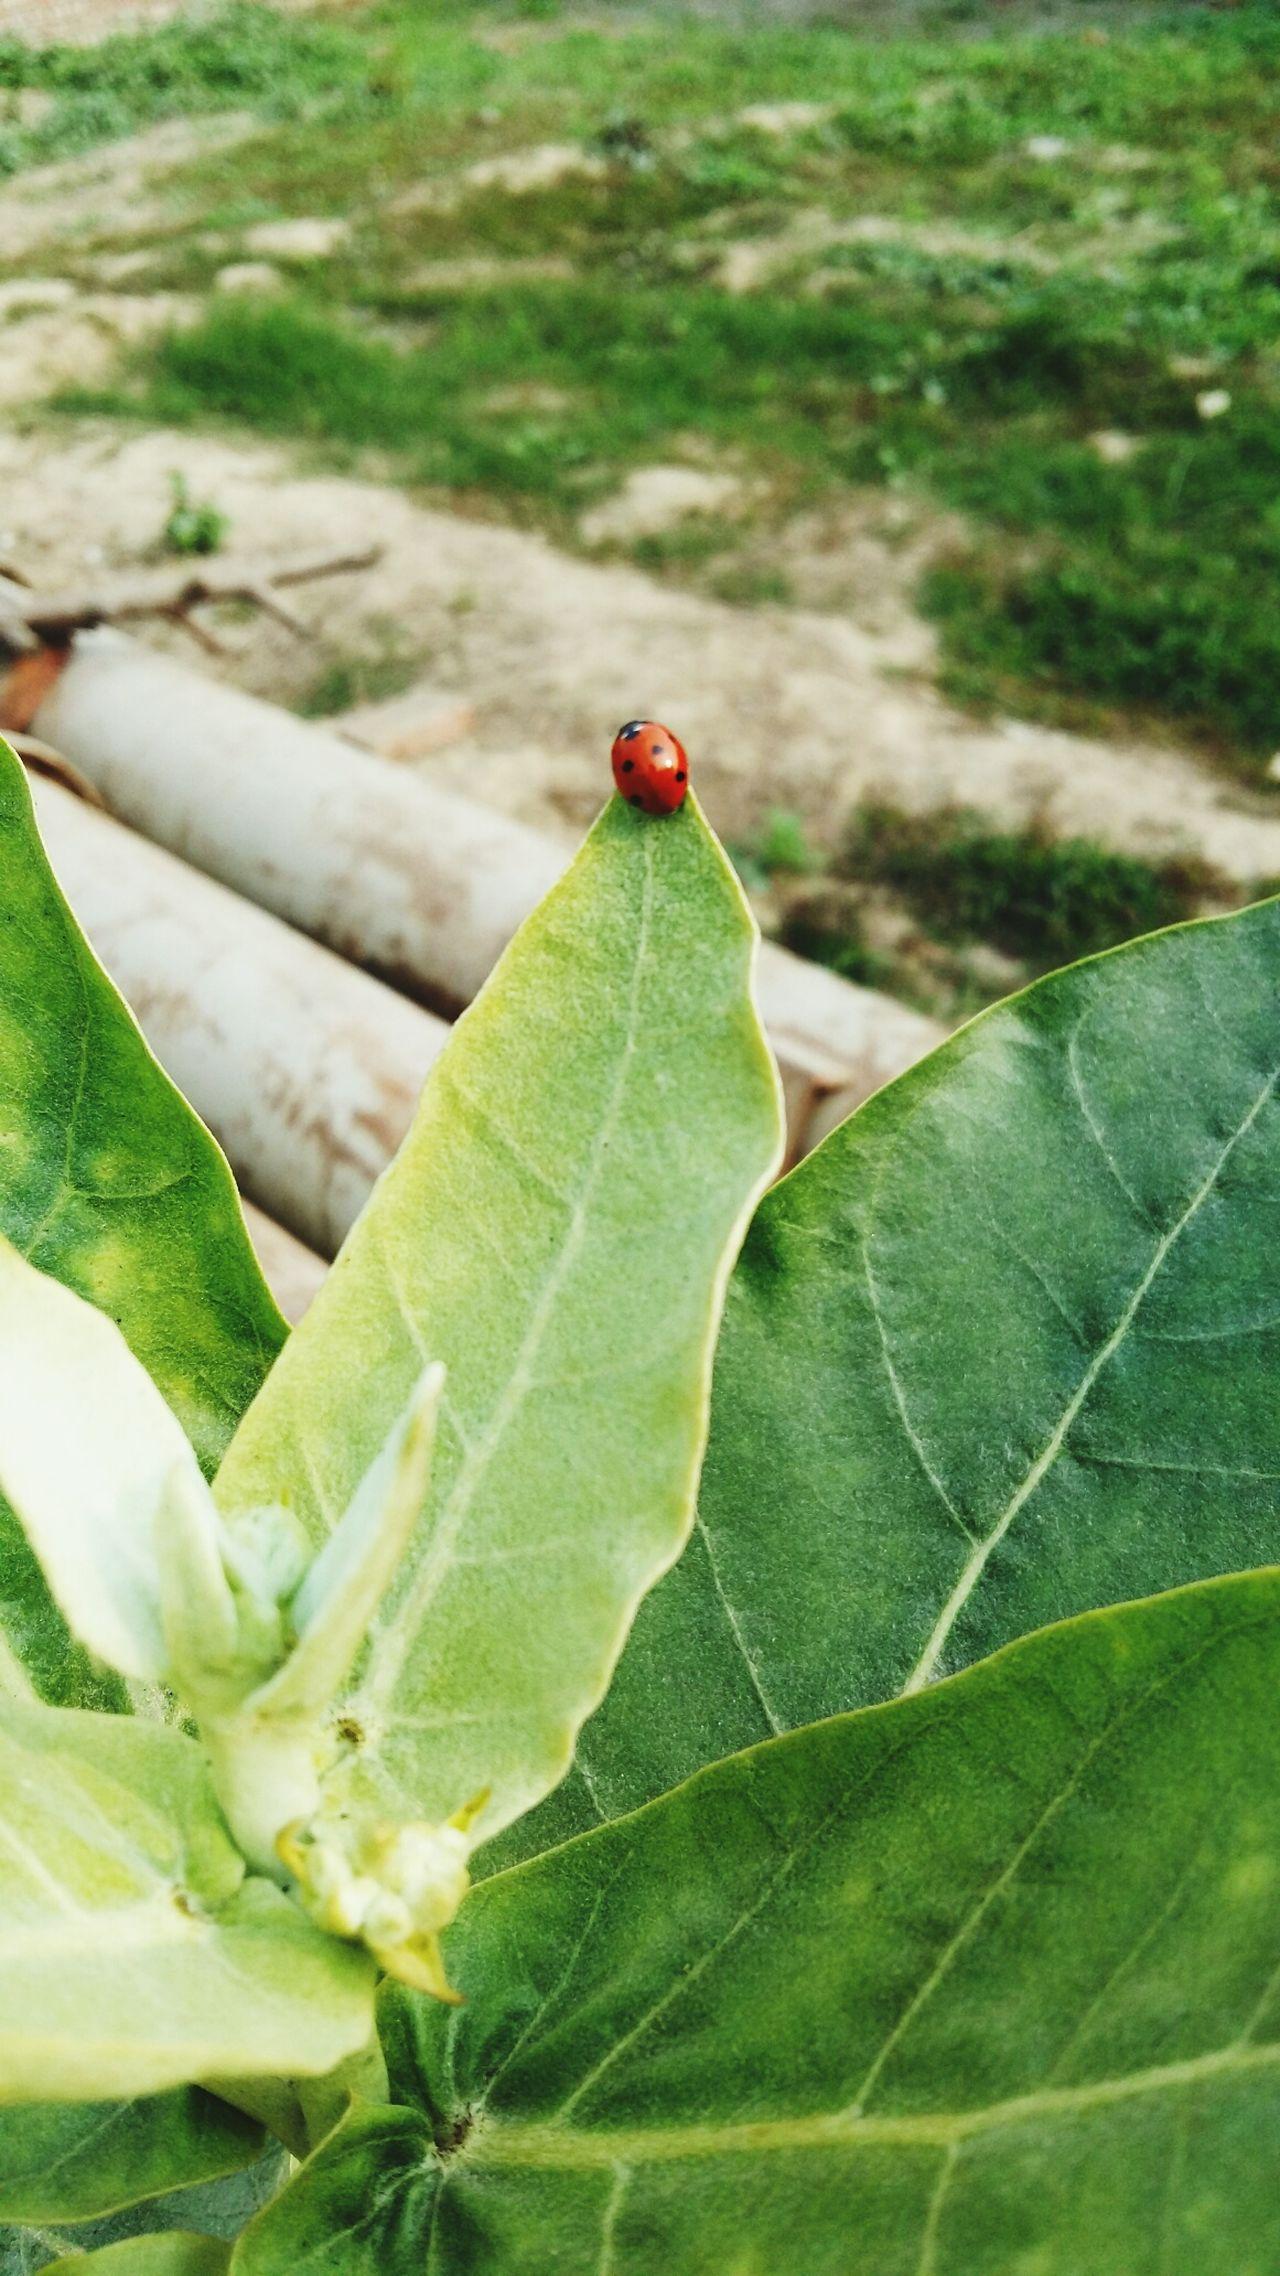 Beetel Nature Photography Plants 🌱 Backyard Backyardphotography